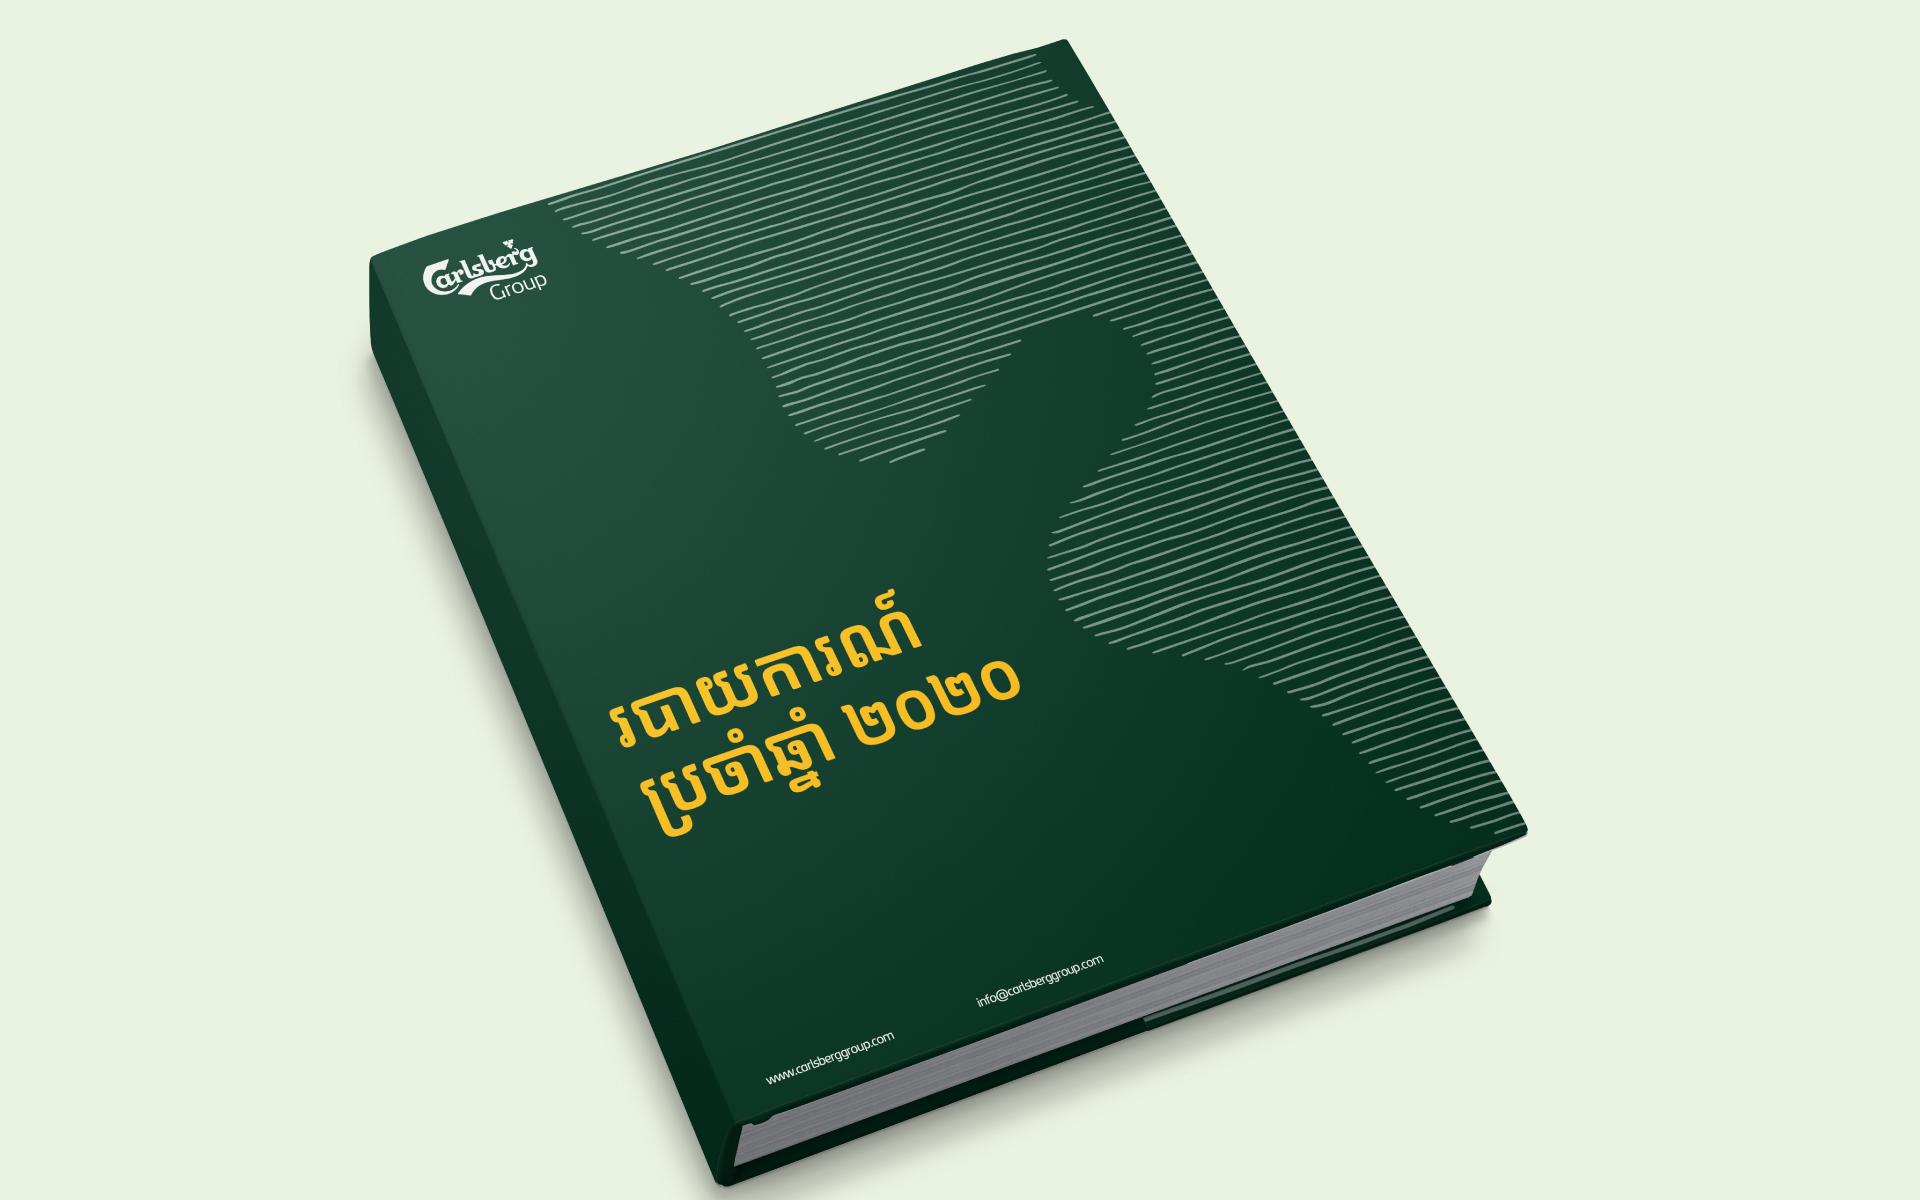 Carlsberg-Sans-Type-Design-21